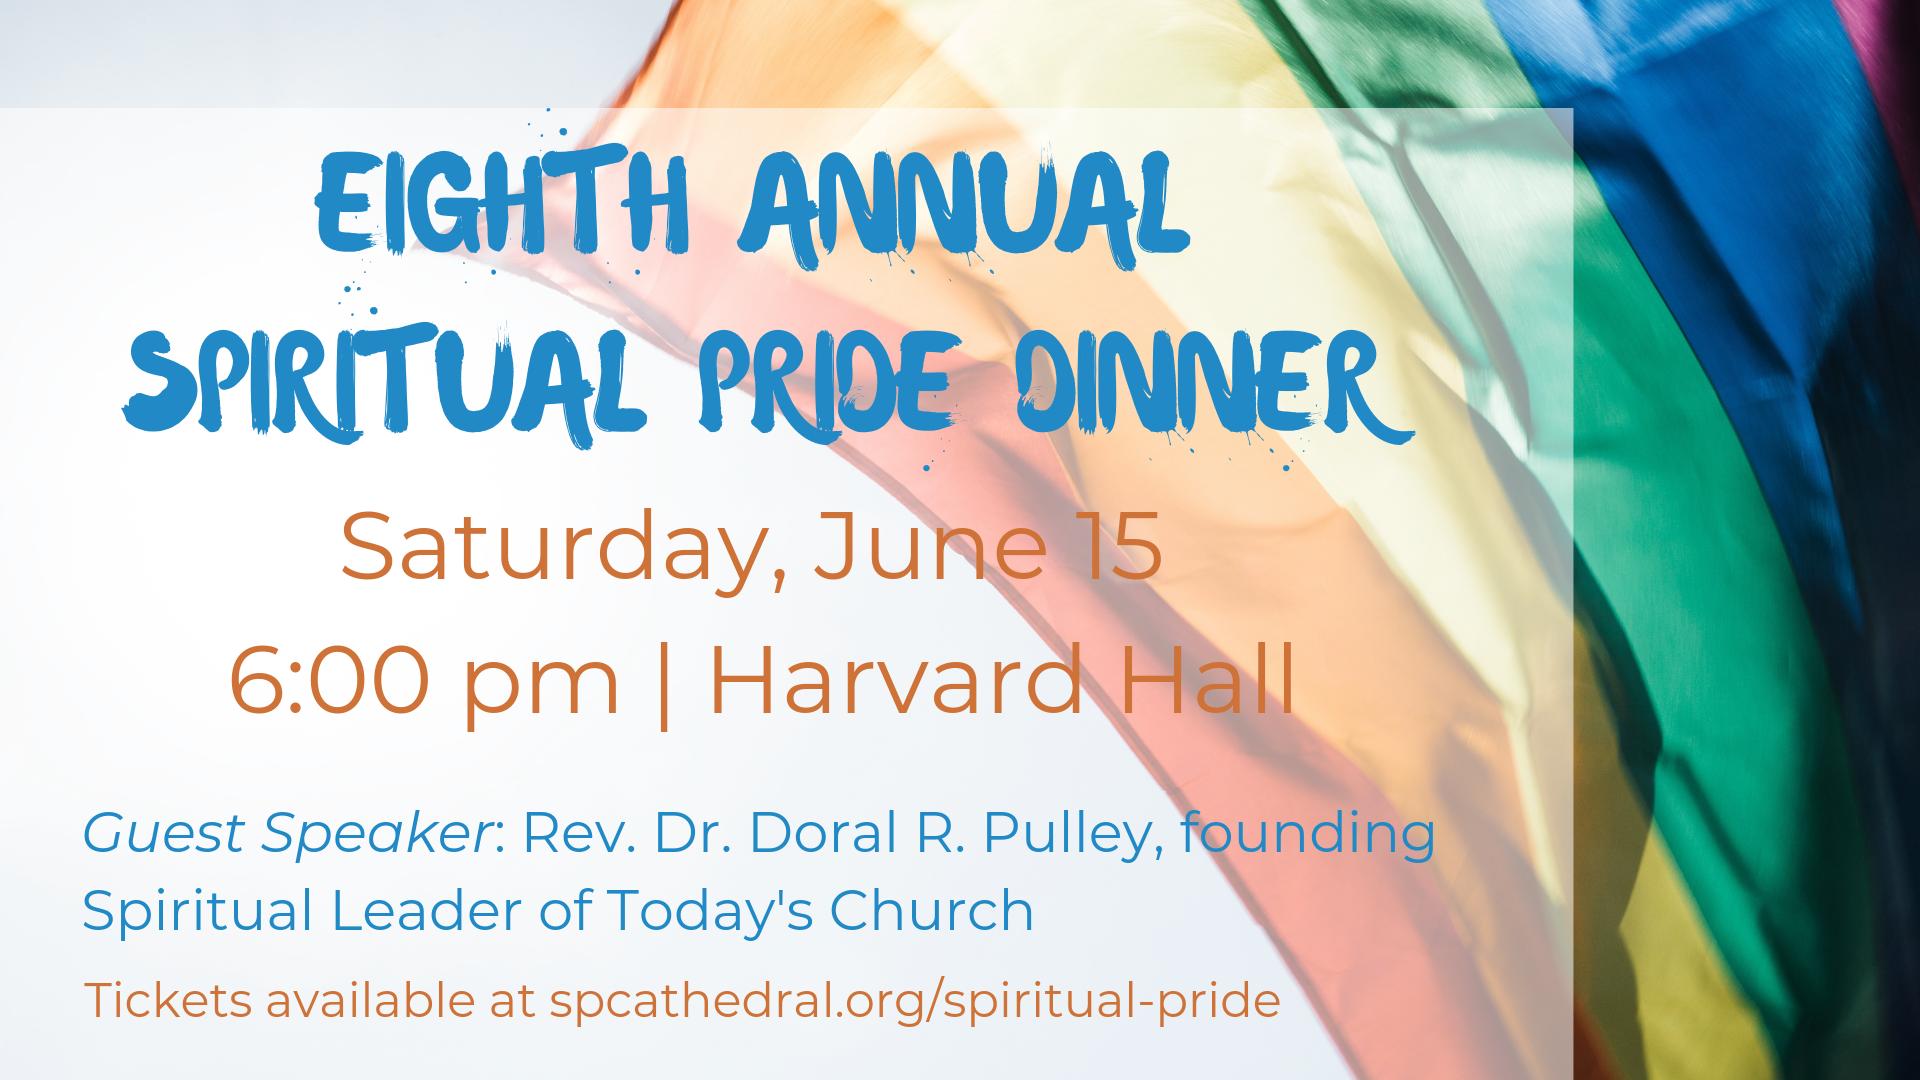 SpiritualPride.png